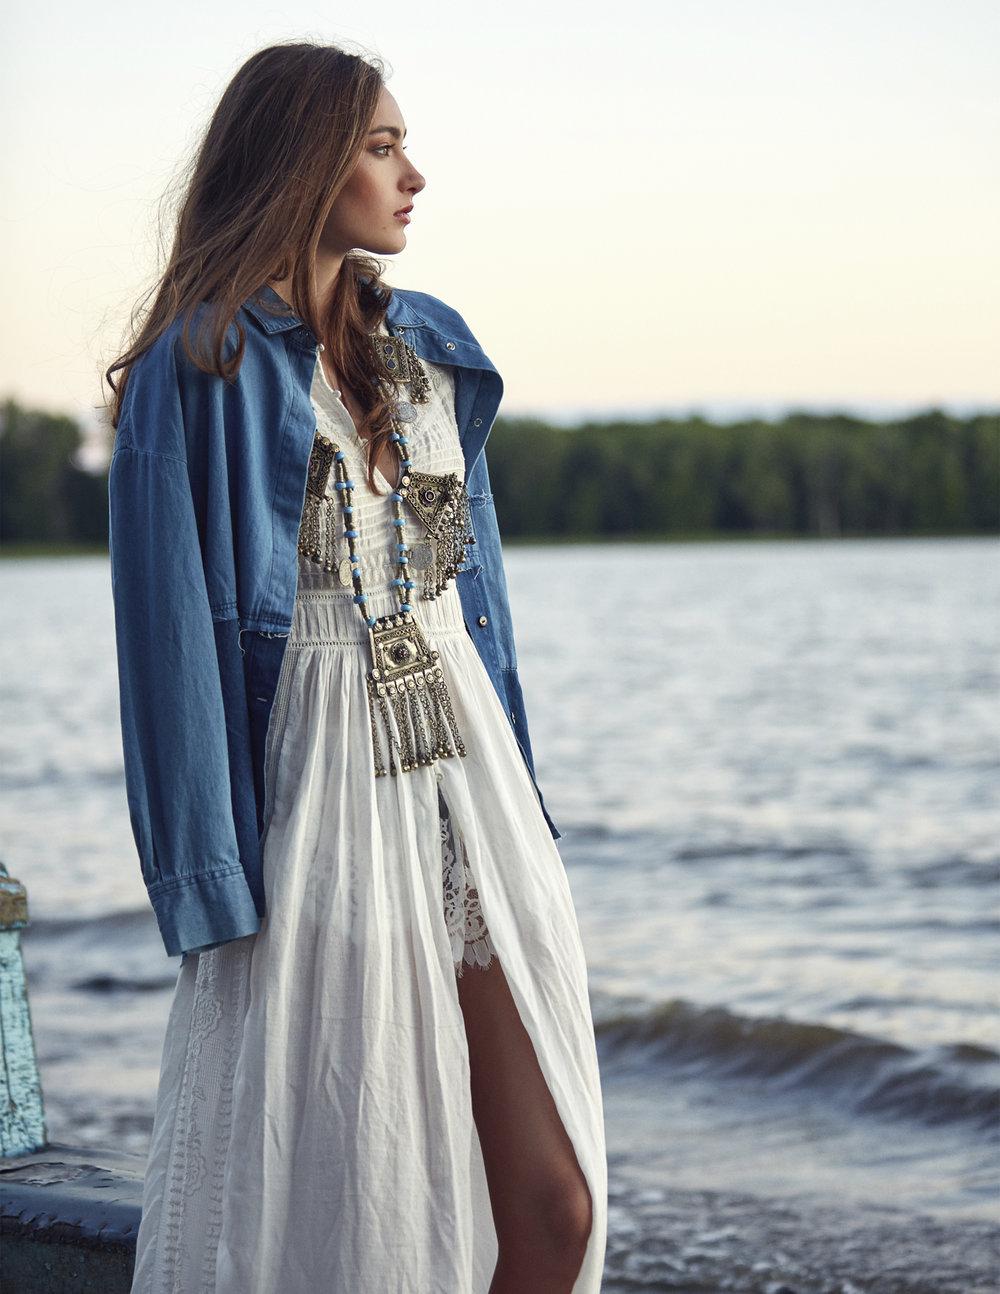 emilie tournevache Boheme fashion photographer